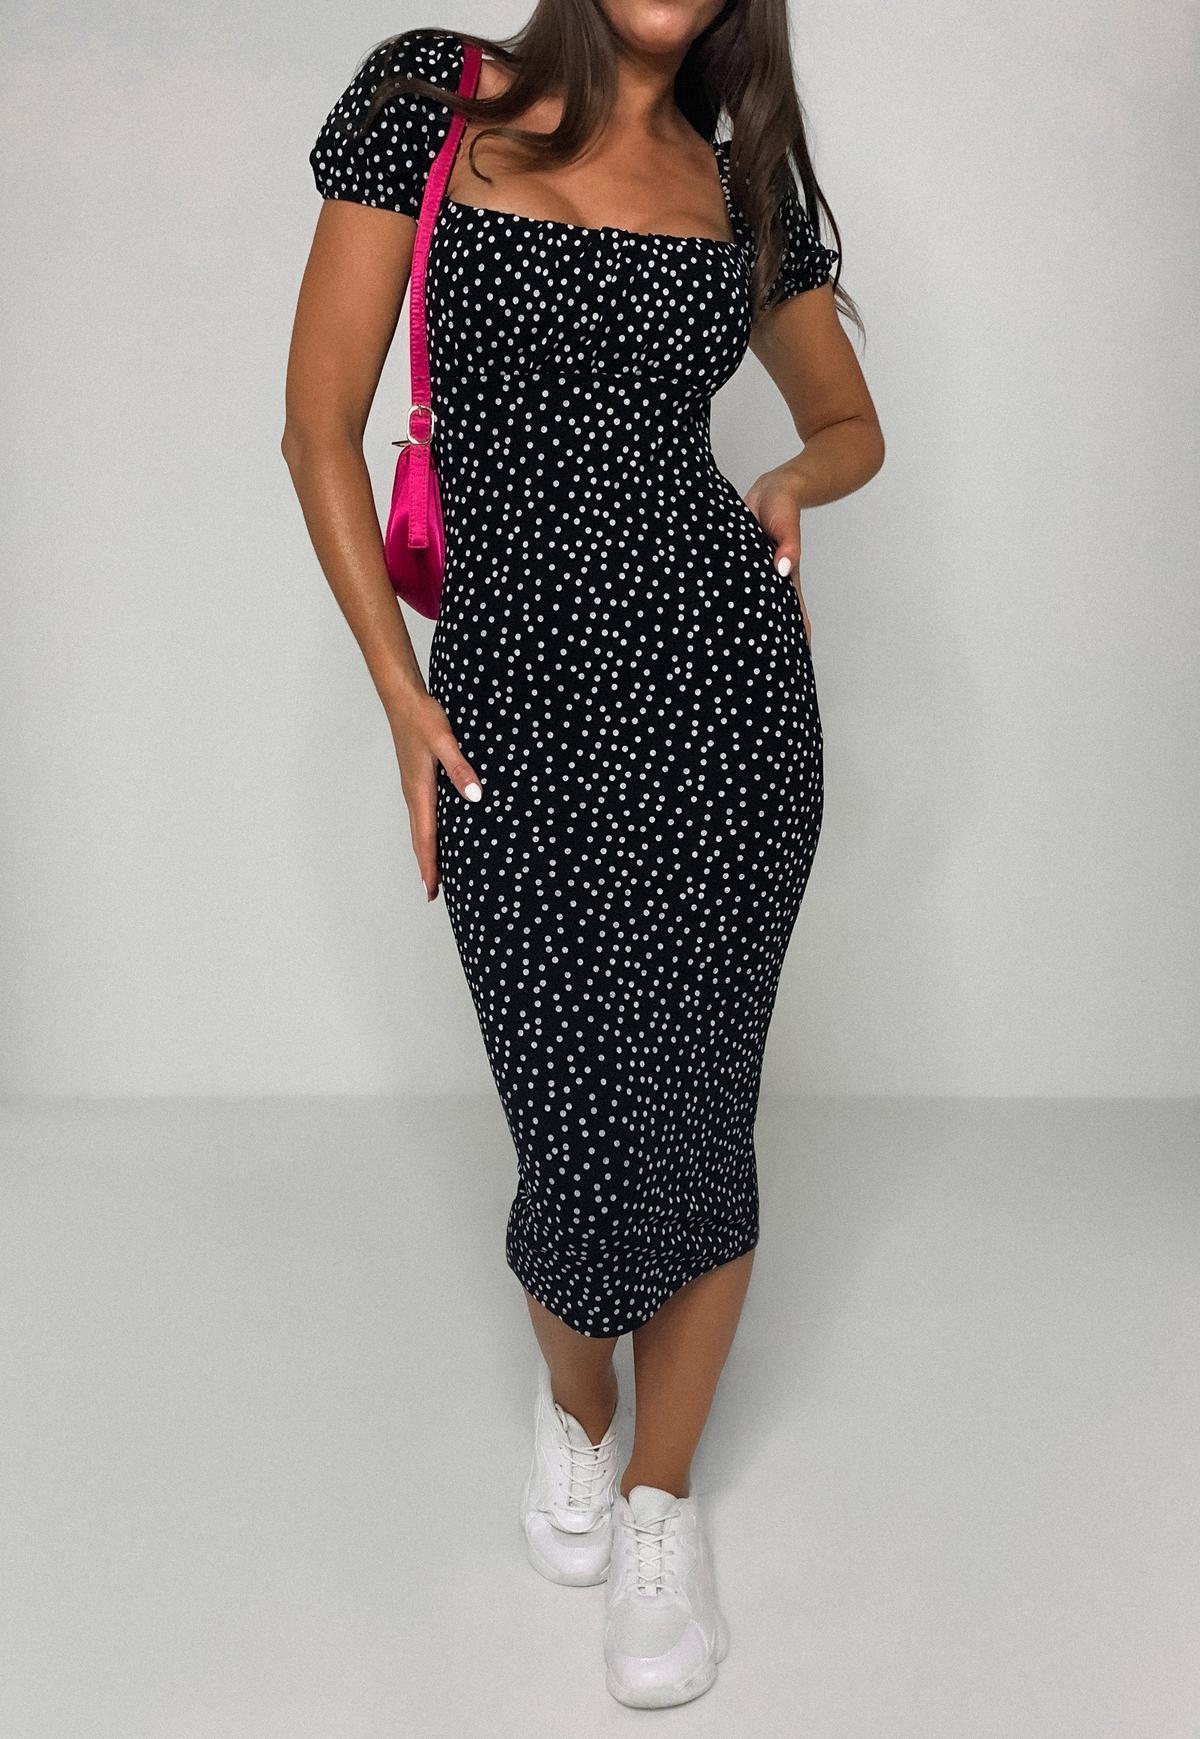 Black Polka Dot Ruched Bust Milkmaid Midi Dress | Missguided